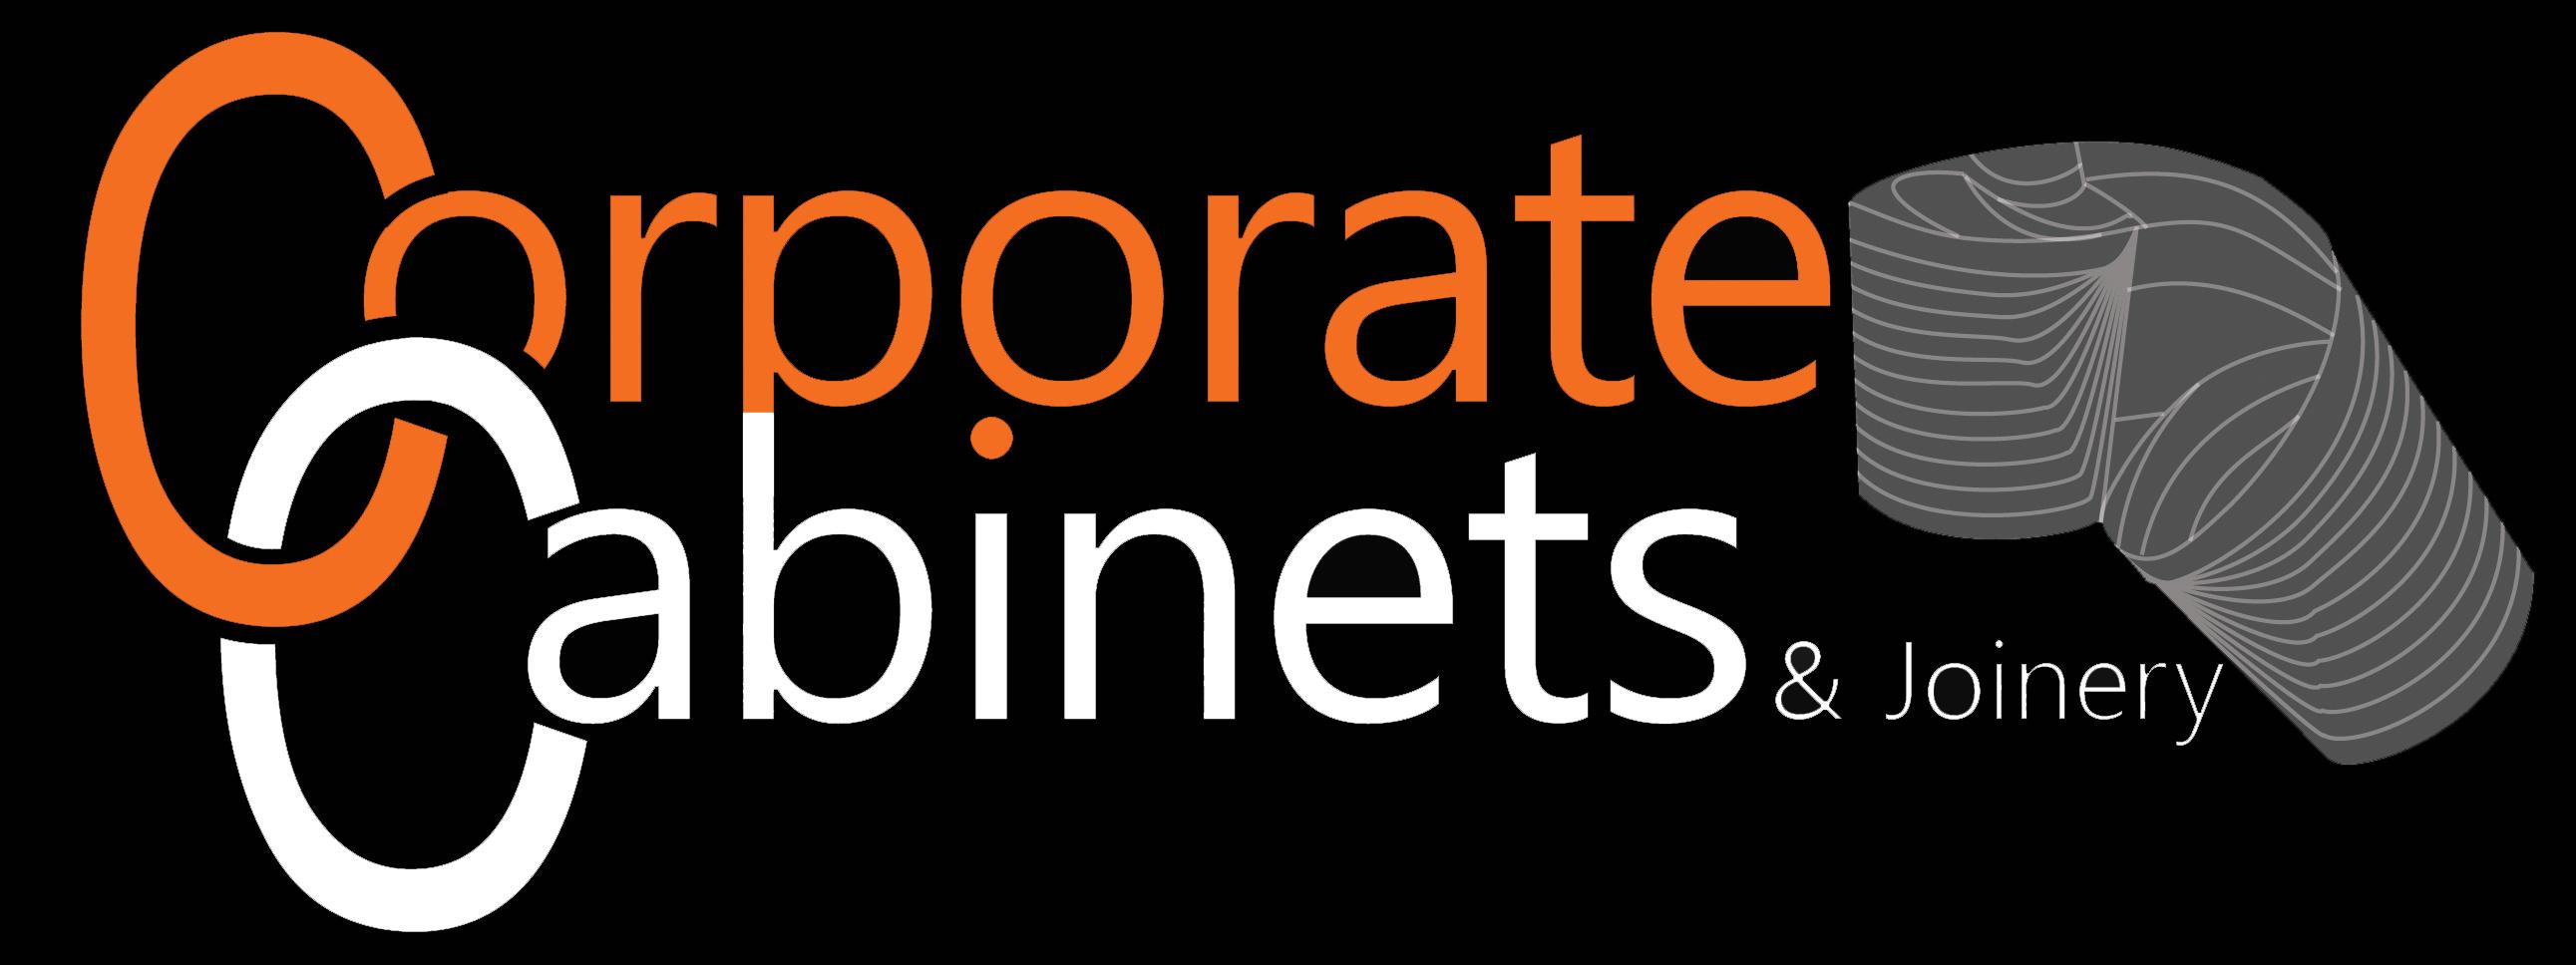 Corporate Cabinets